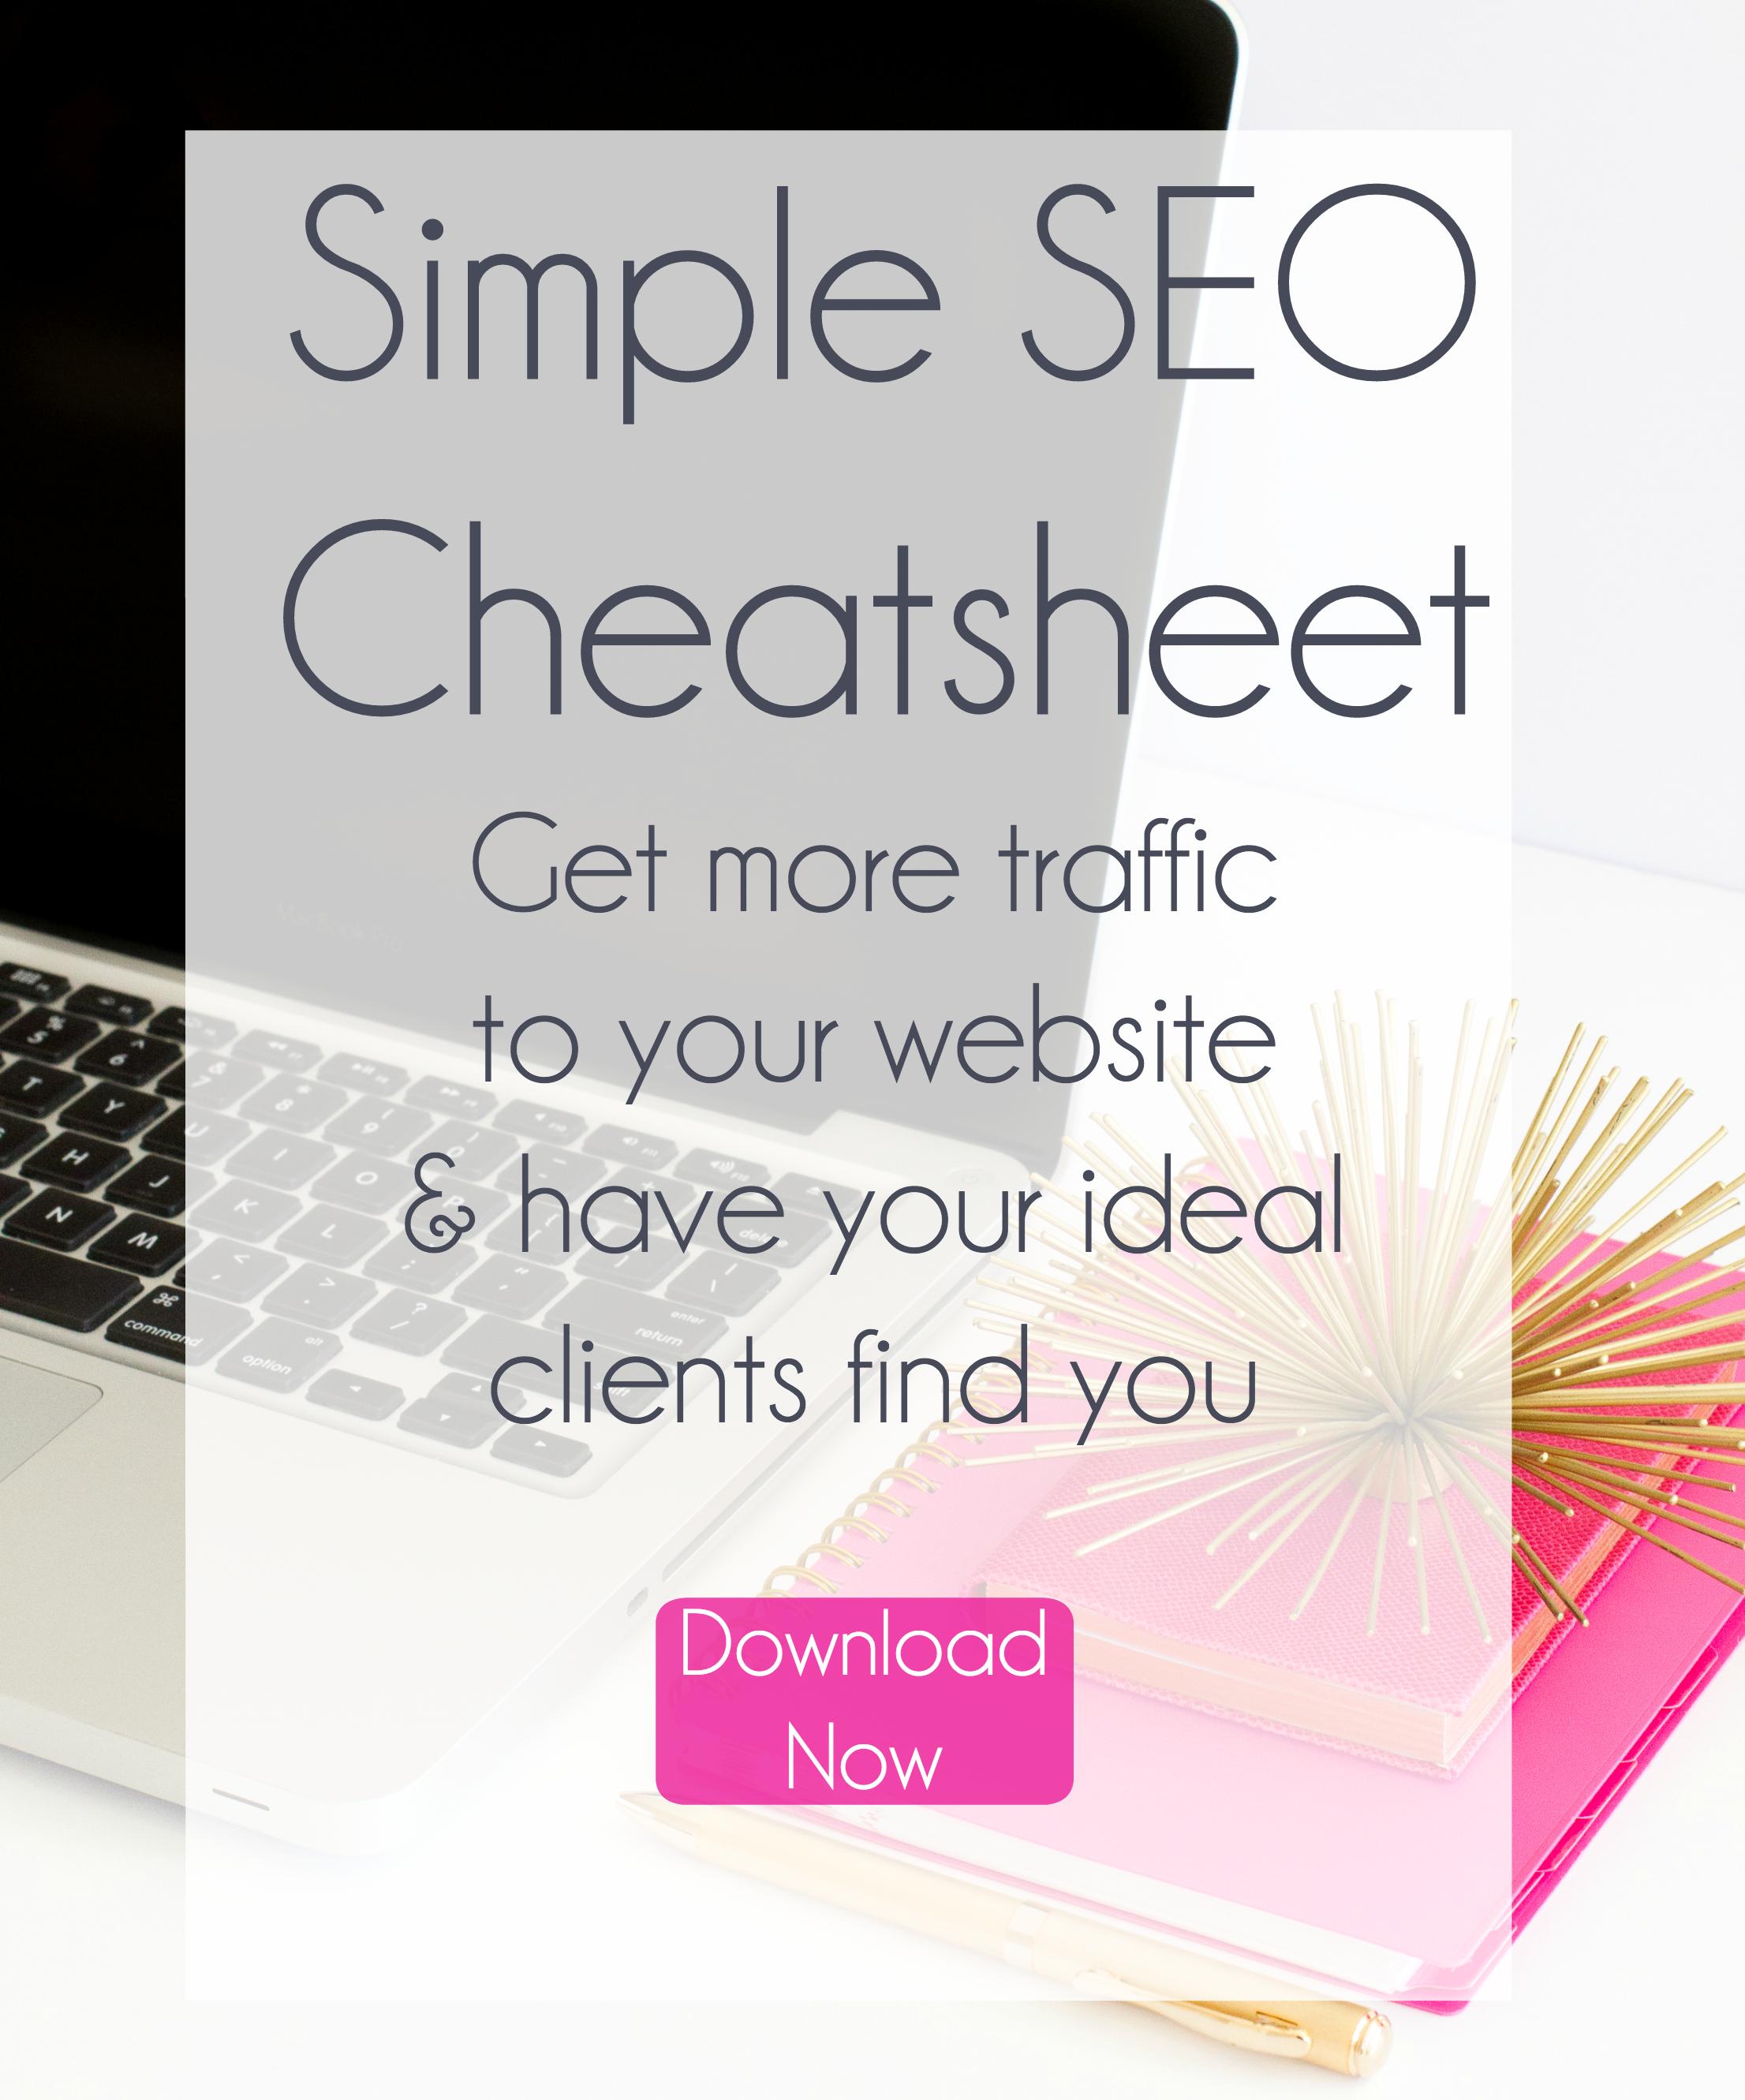 get more traffic to your website seo cheatsheet